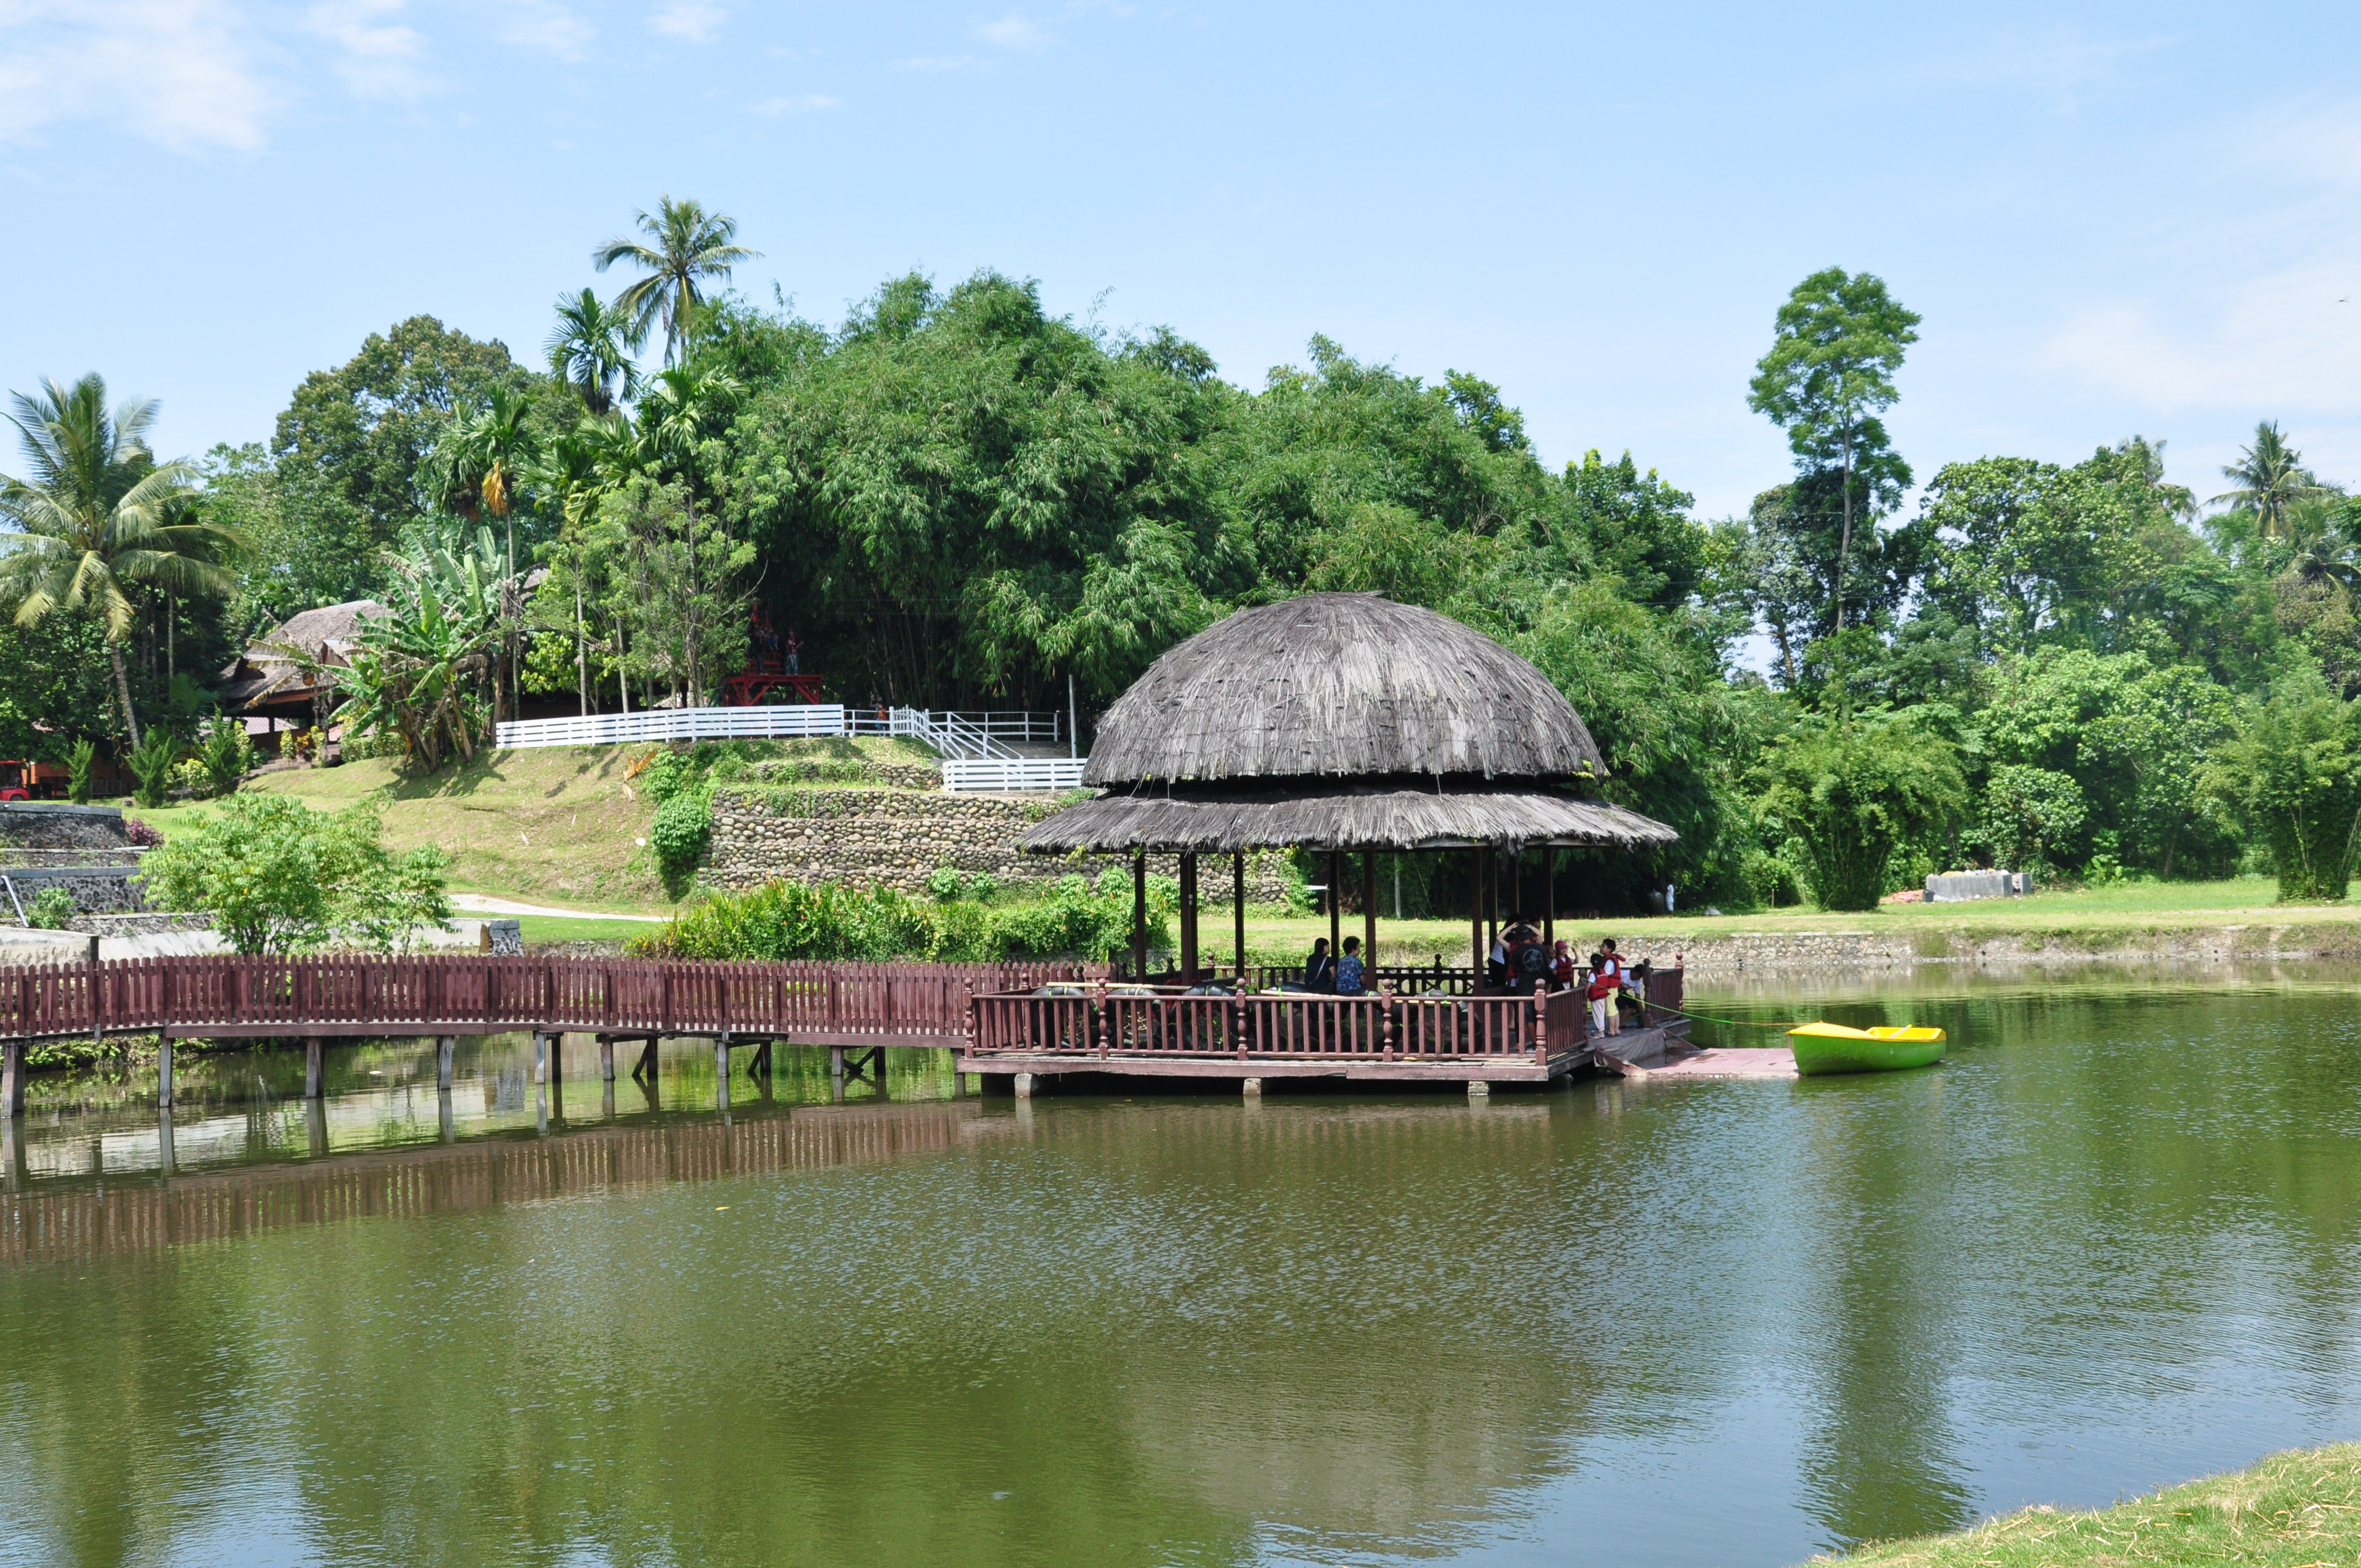 Kampung Ladang Fandryjalanjalan Pemerintah Beserta Rombongan Datang Melakukan Acara Buat